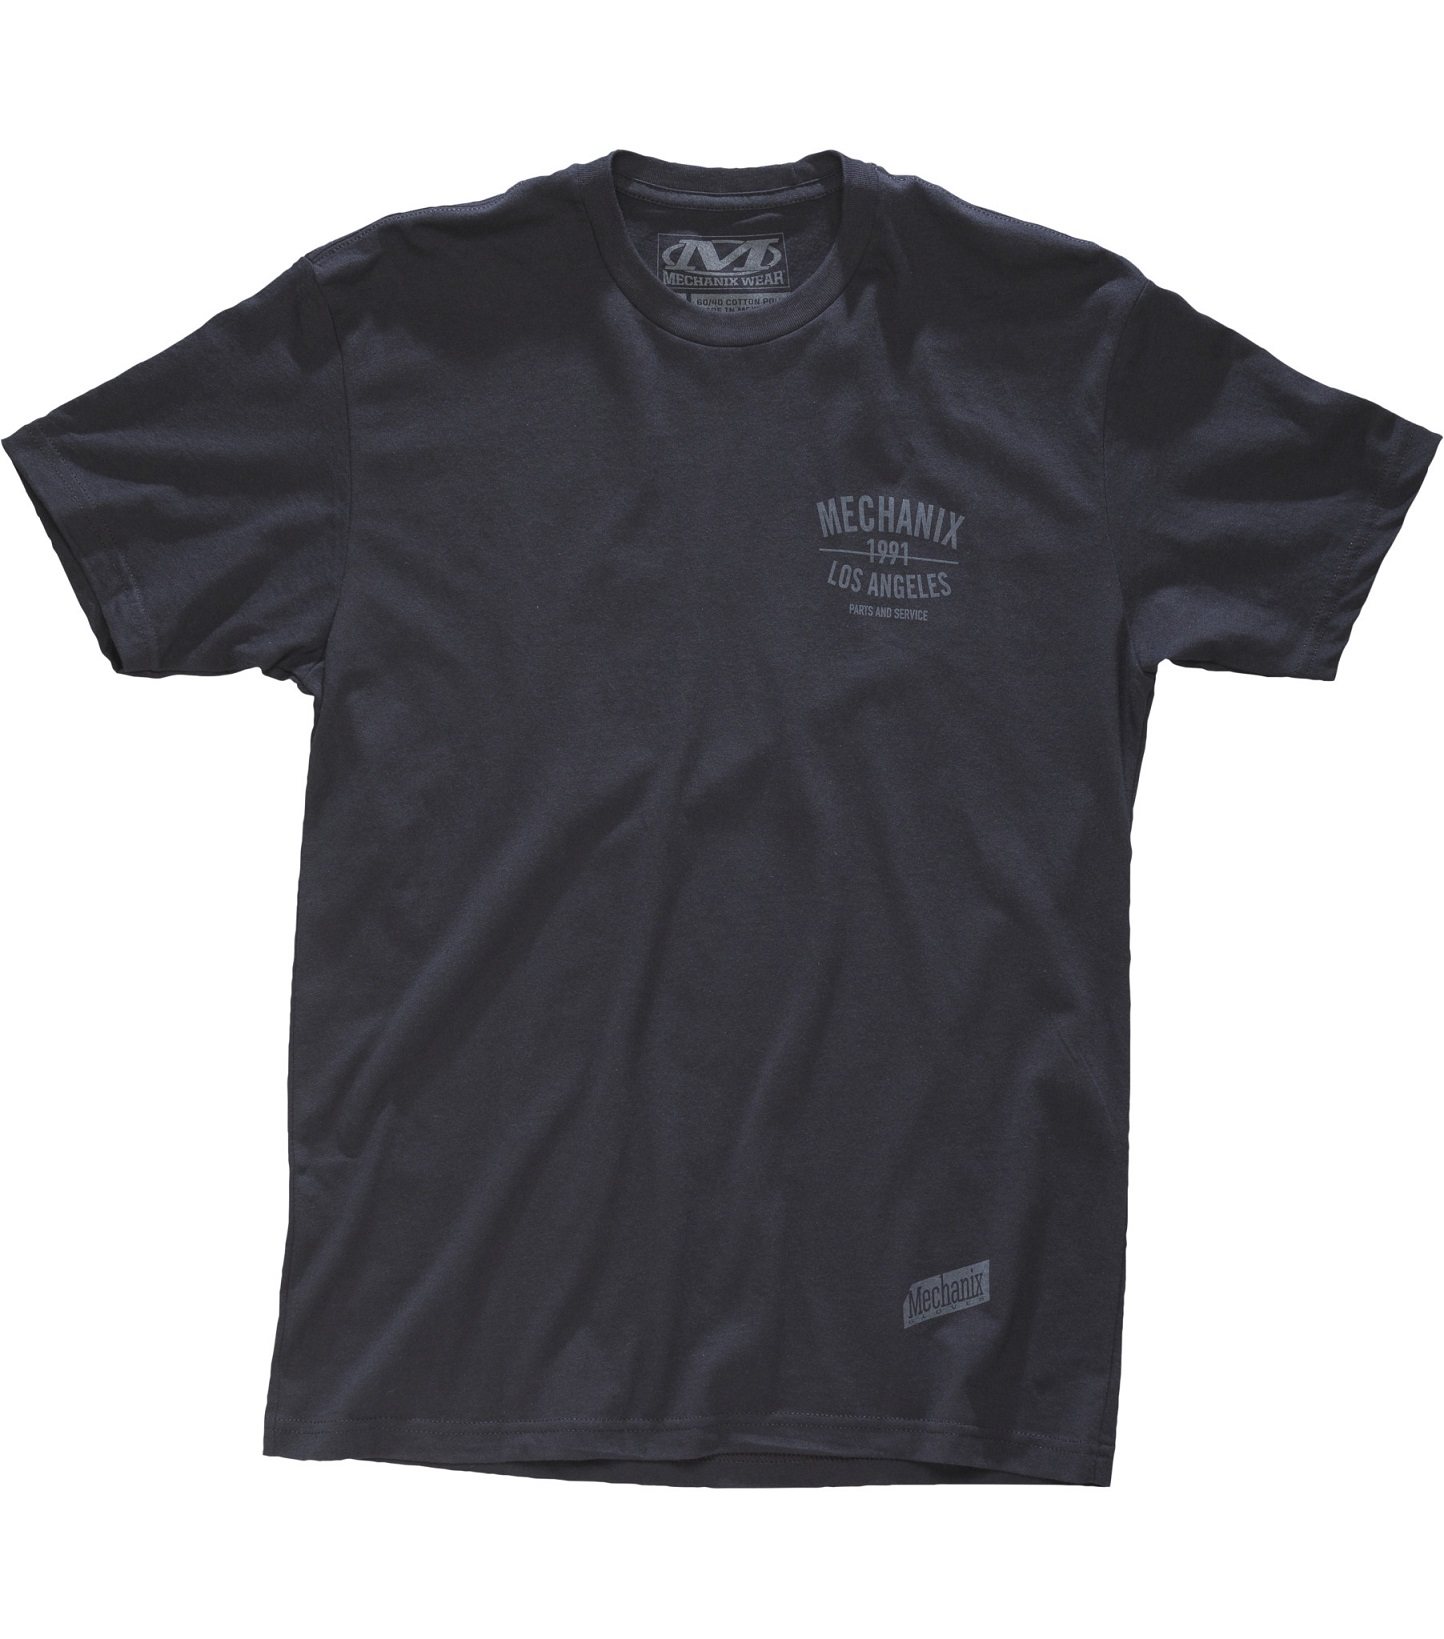 Camiseta Parts & Service - MWS-PS - Mechanix